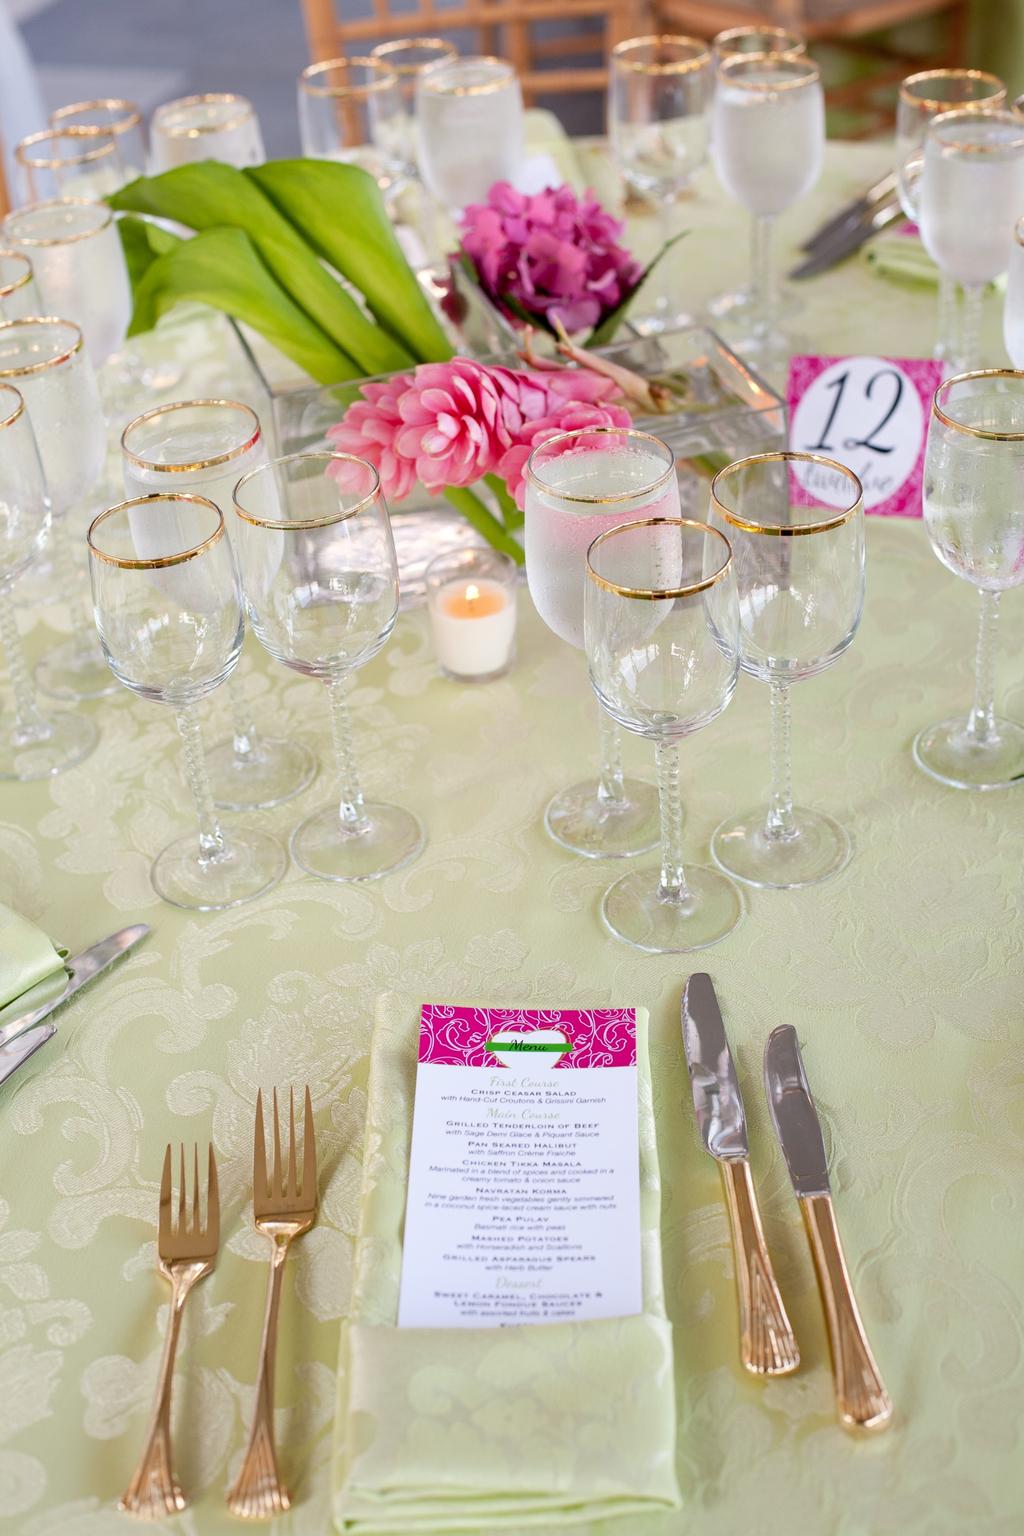 Elegant-wedding-reception-decor-pink-wedding-flowers-indian-ceremony-tropical-blooms-outdoor-venue.full